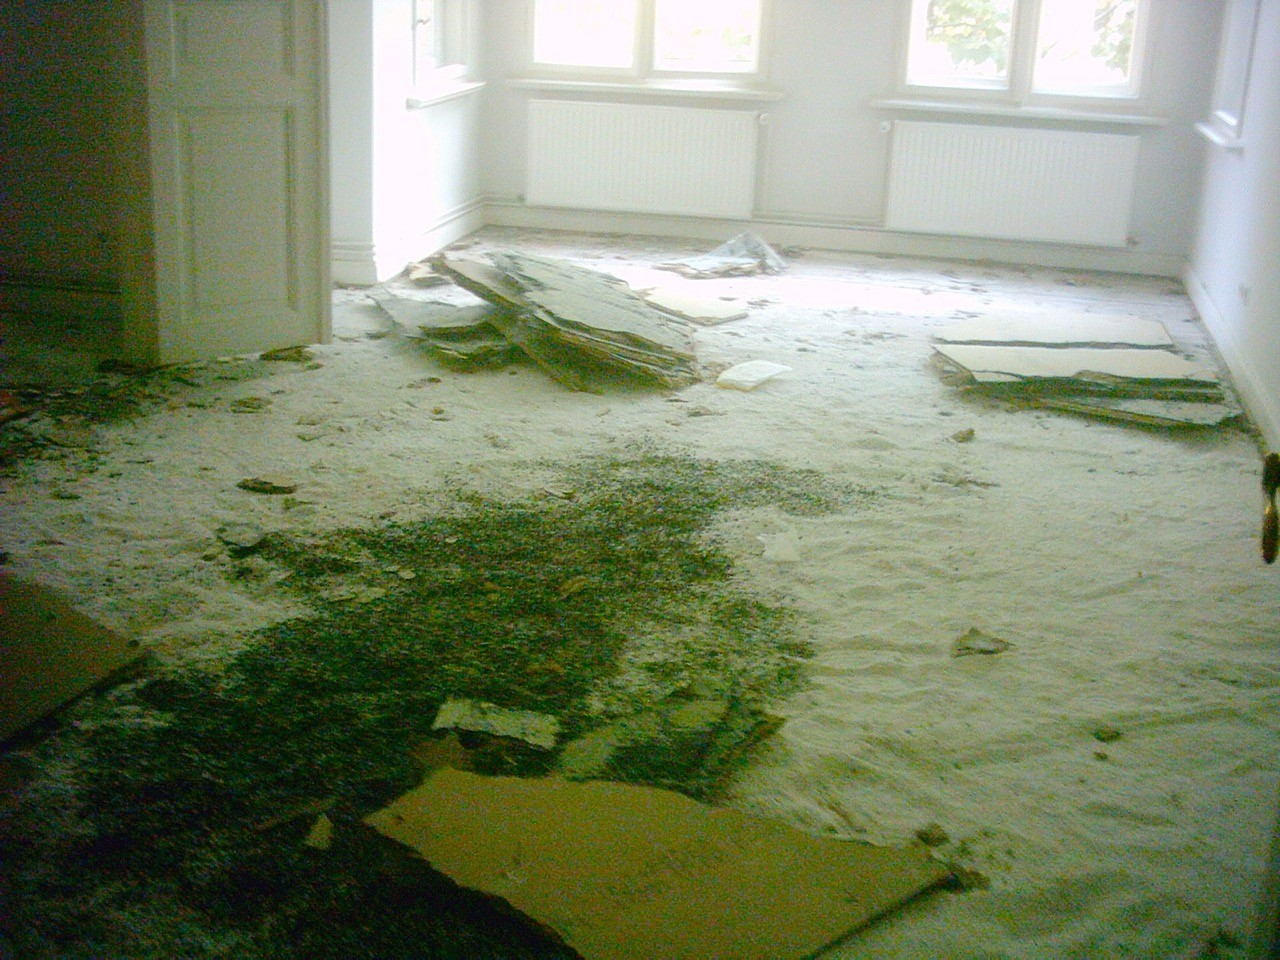 Fischgrätparkett unter Granulatschüttung, Spanplatten und Teppich